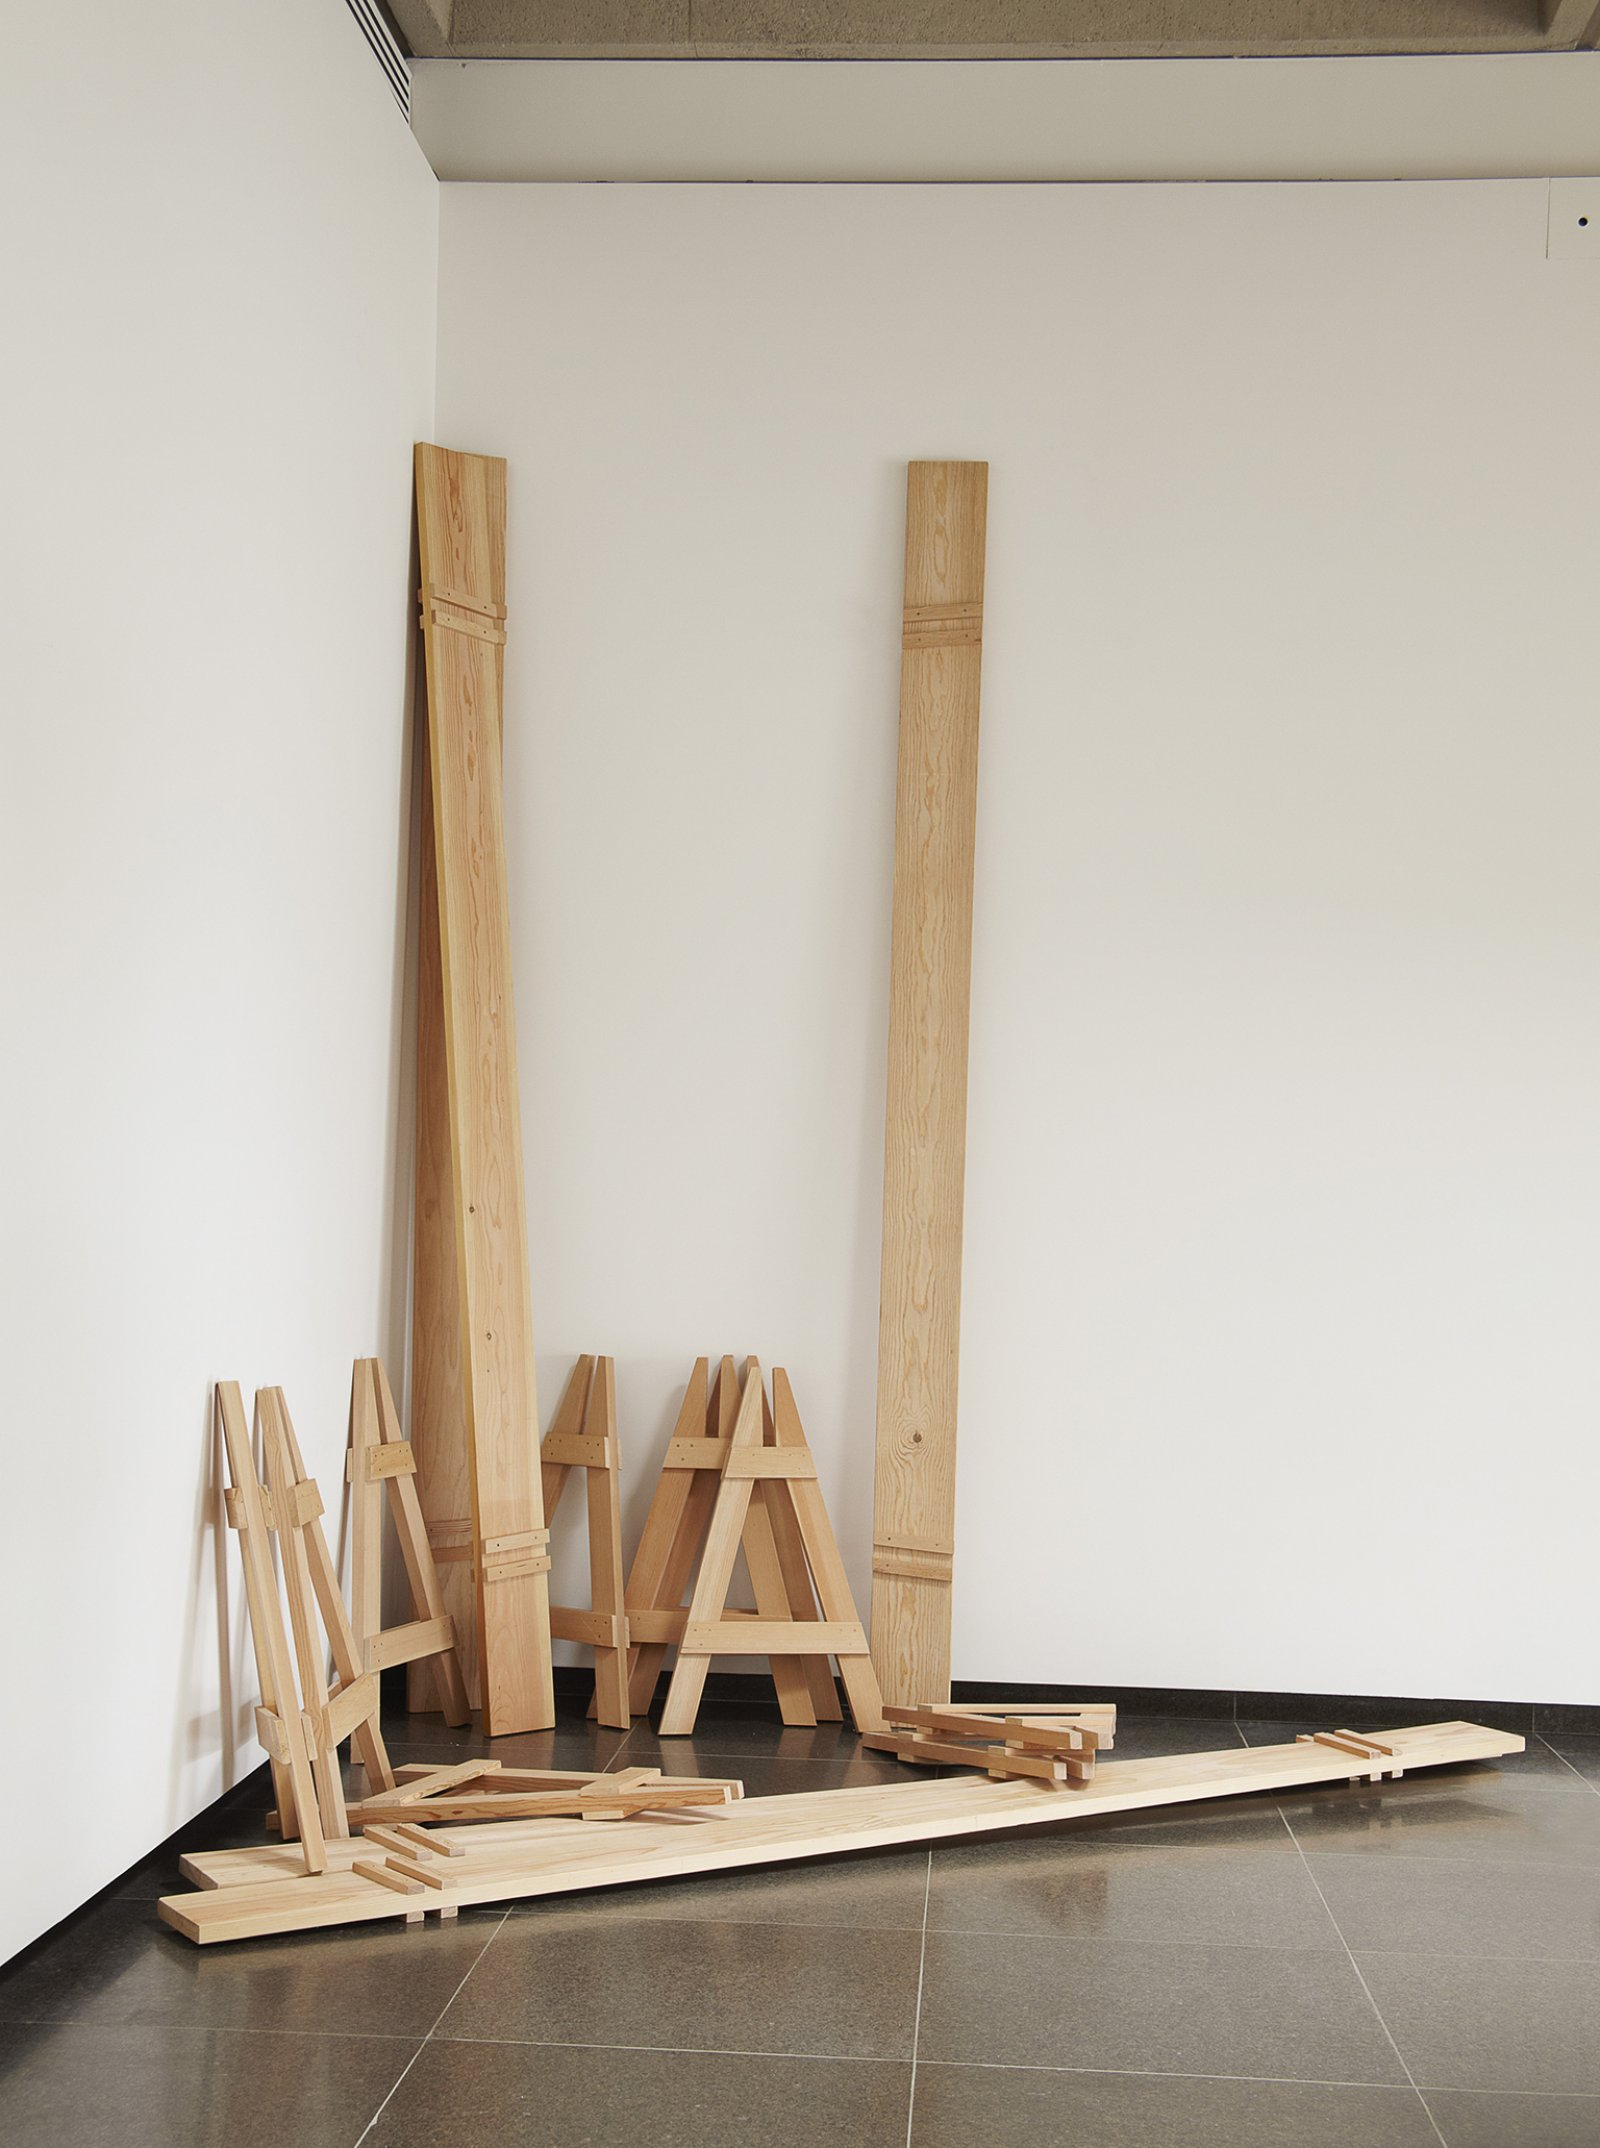 Brian Jungen,Barricades, 2010, fir, each 41 x 26 x 144 in. (104 x 66 x 366 cm).Installation view,Tomorrow, Repeated, Art Gallery of Ontario, Toronto, 2011